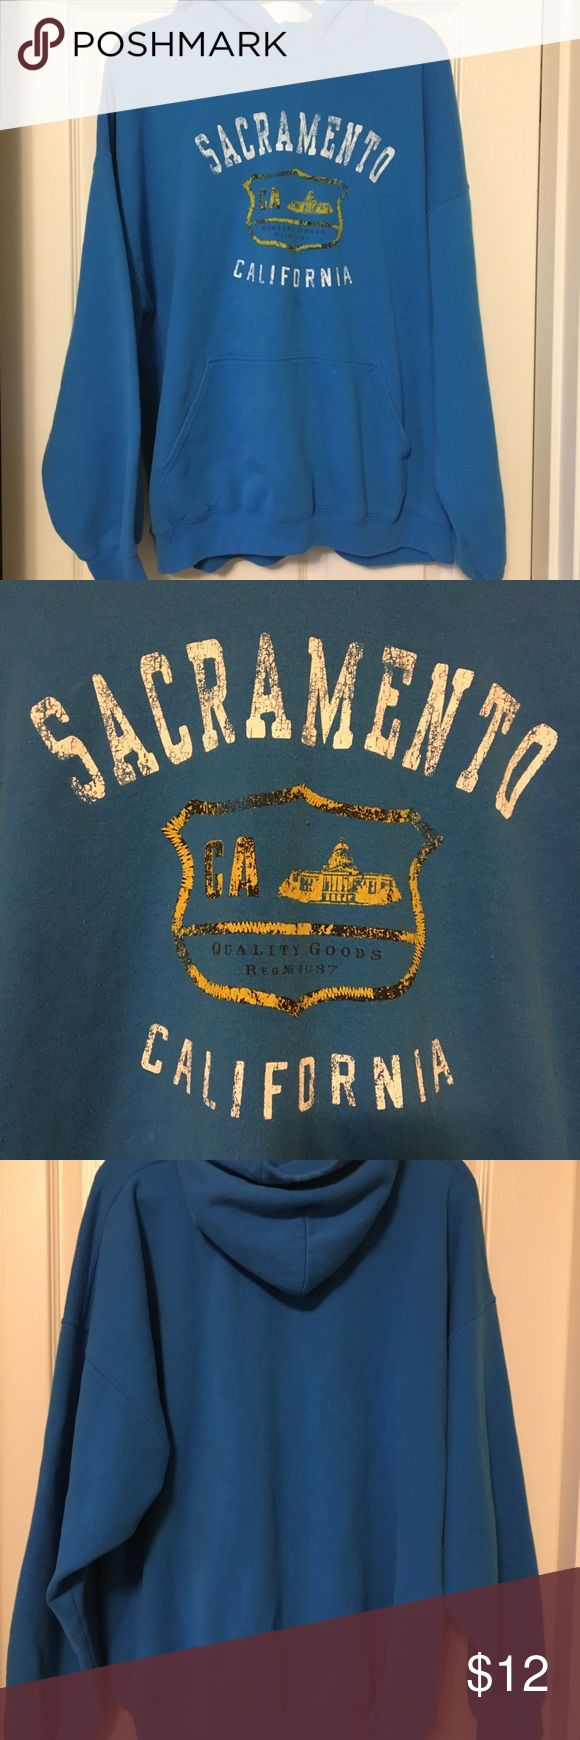 SACRAMENTO CALIFORNIA sweatshirt SACRAMENTO CALIFORNIA blue hooded sweatshirt. Tops Sweatshirts & Hoodies